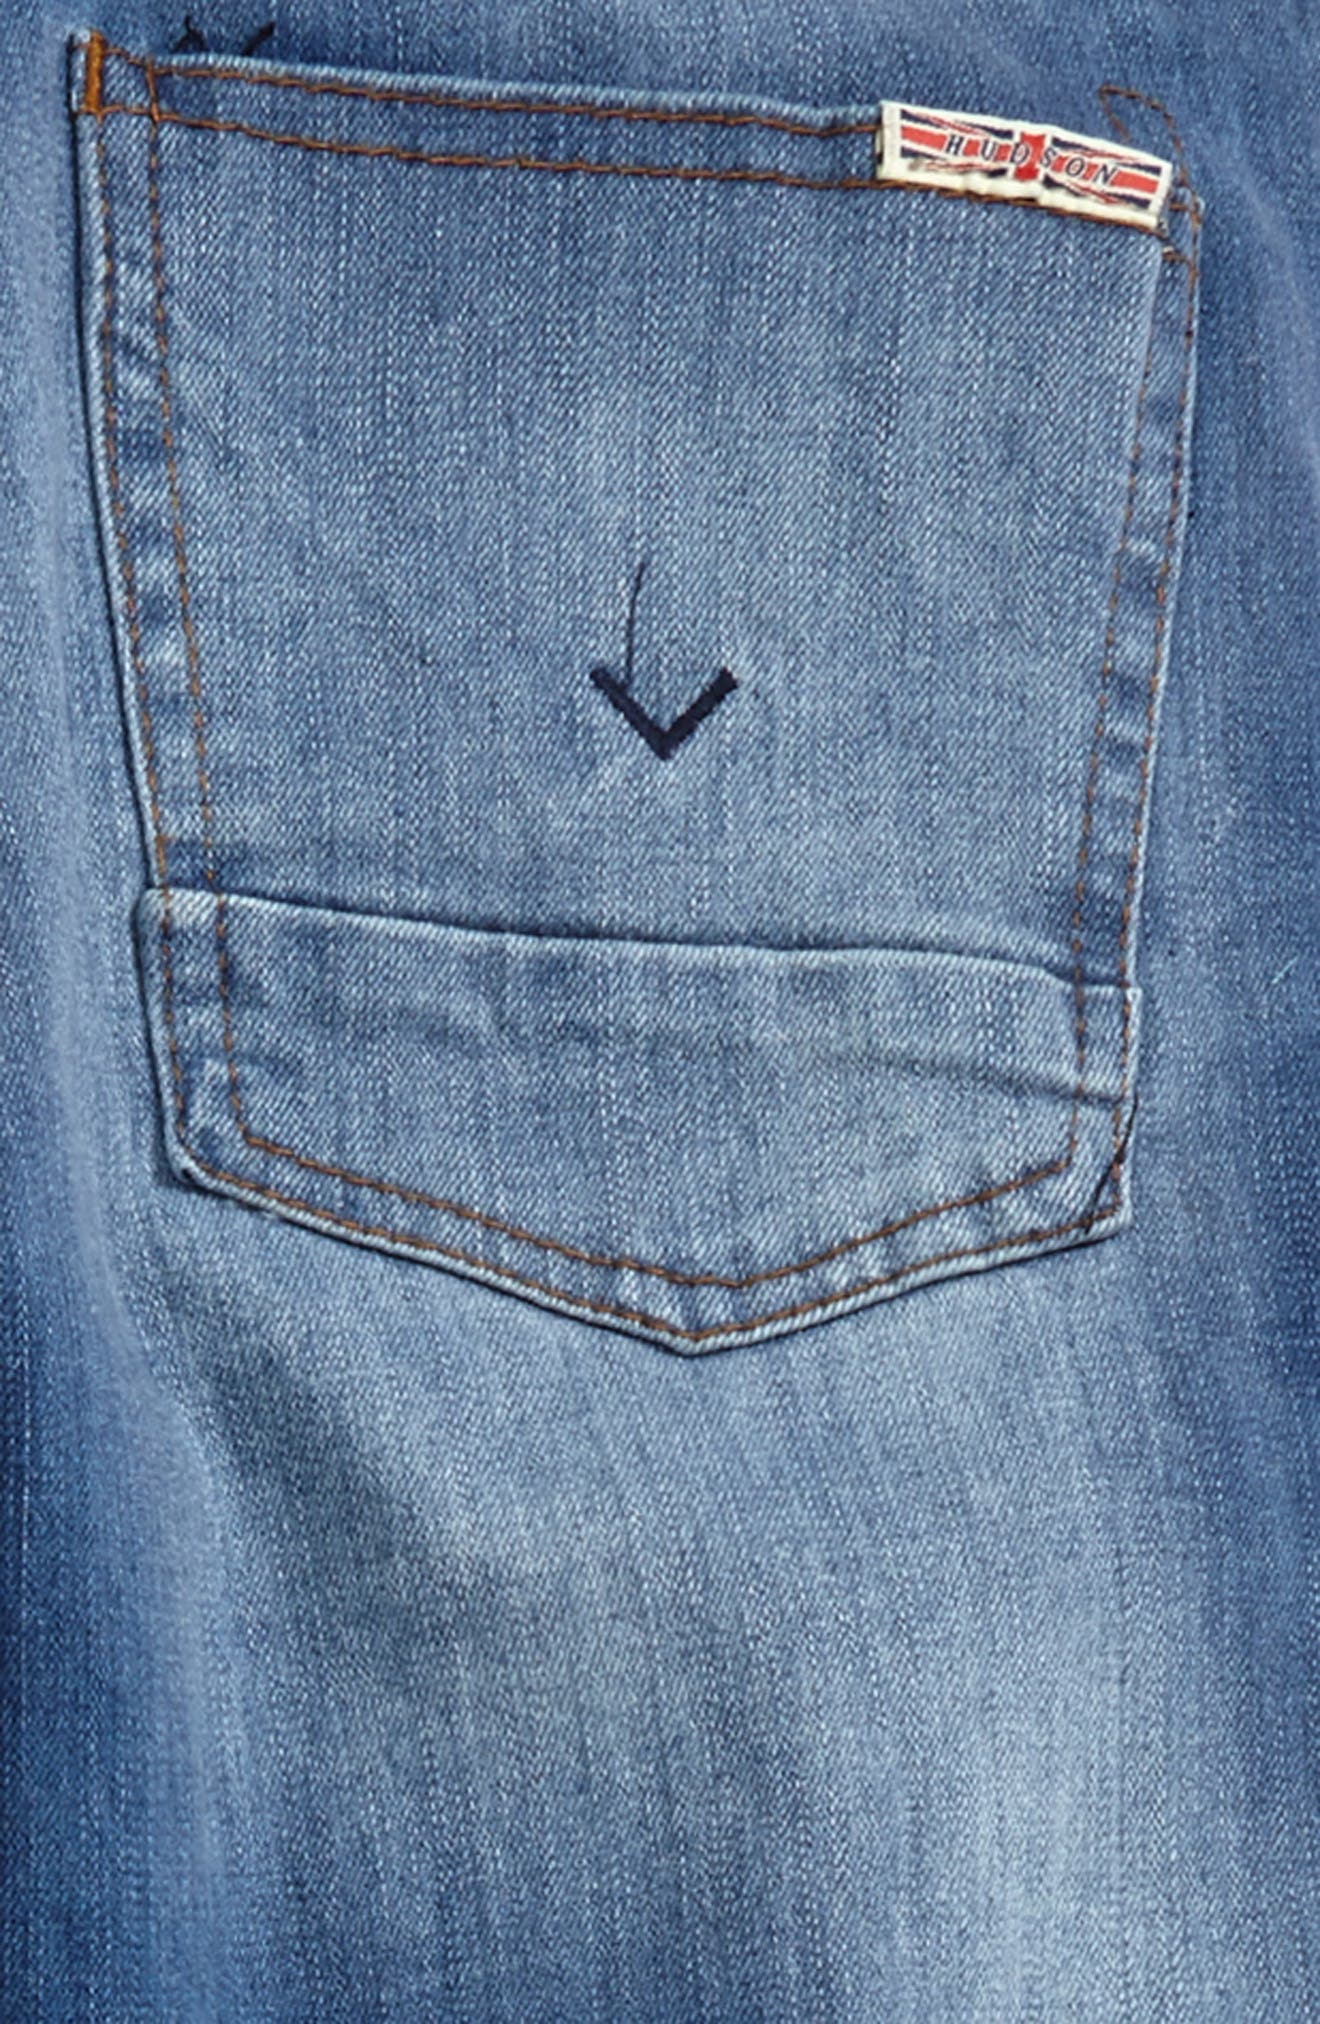 Jagger Slim Fit Straight Leg Jeans,                             Alternate thumbnail 3, color,                             Zenith